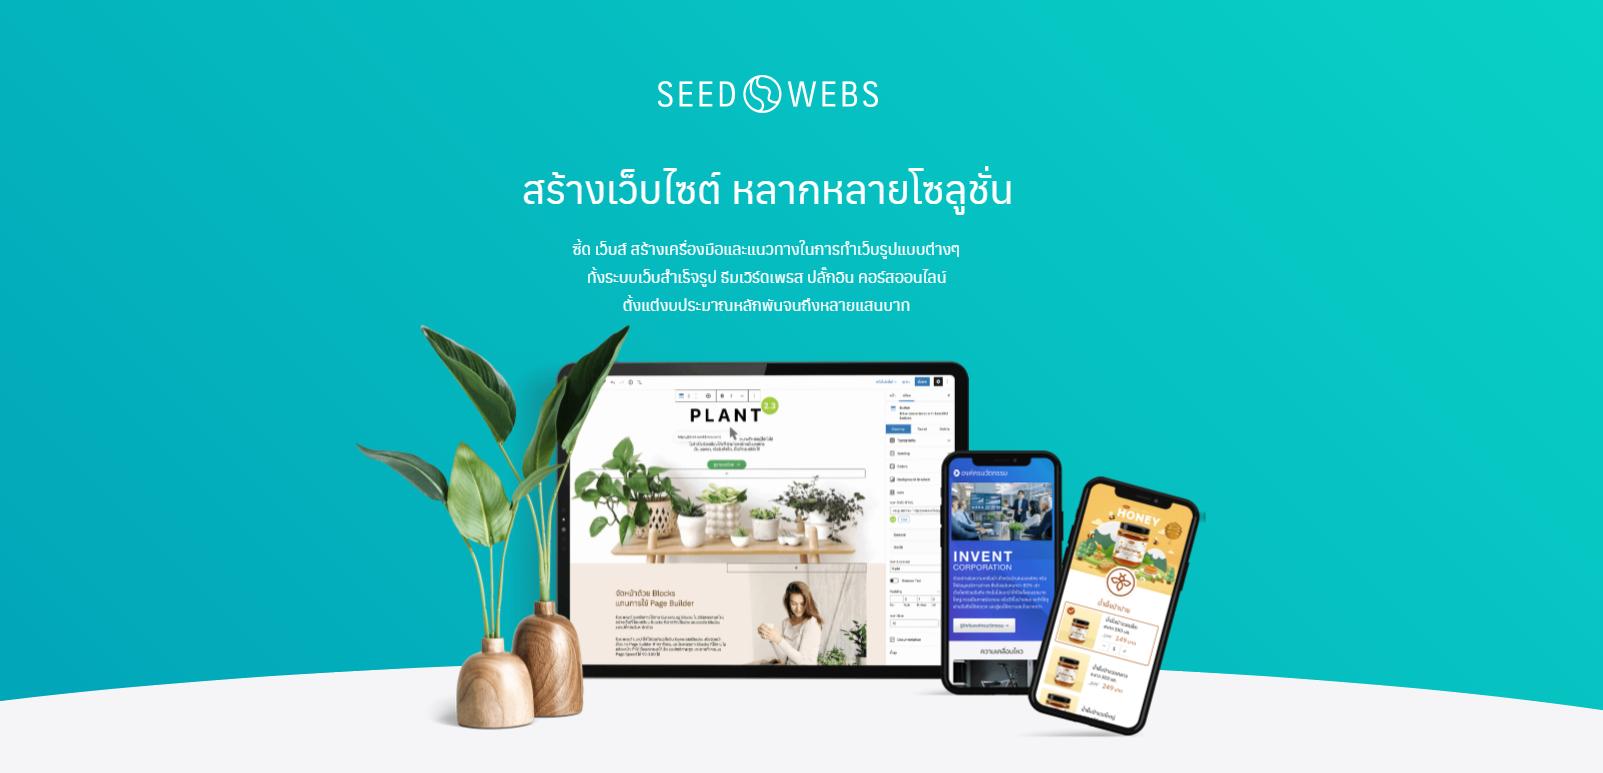 Seed Webs